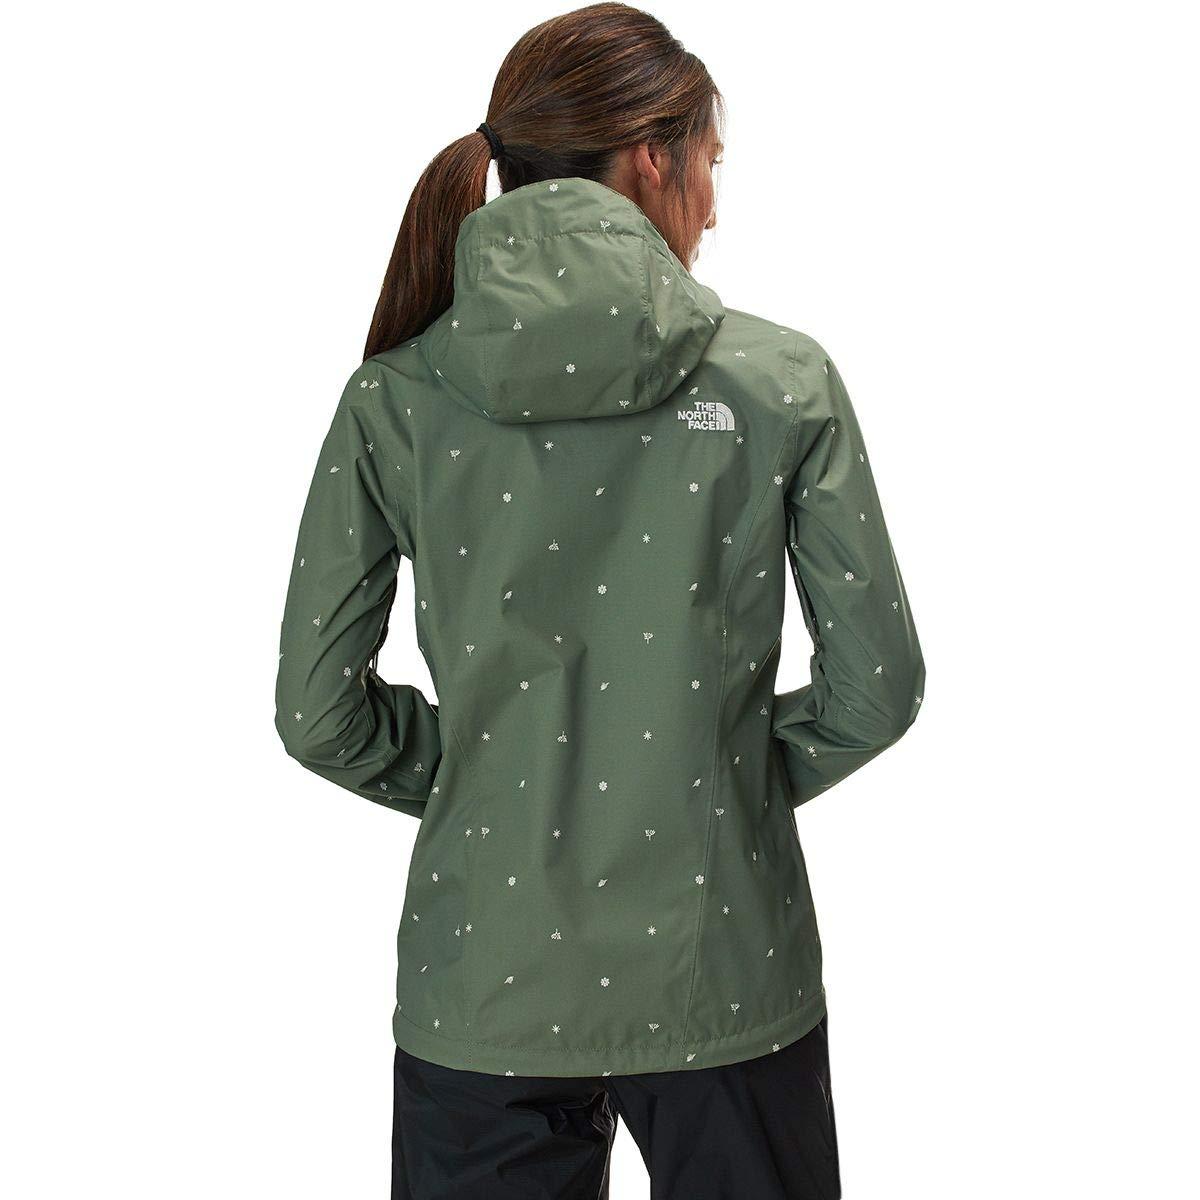 27ca6f4f88 THE NORTH FACE Print Venture Jacket Women Blue Wing Teal Joshua Tree Print  2019 Funktionsjacke: Amazon.de: Sport & Freizeit